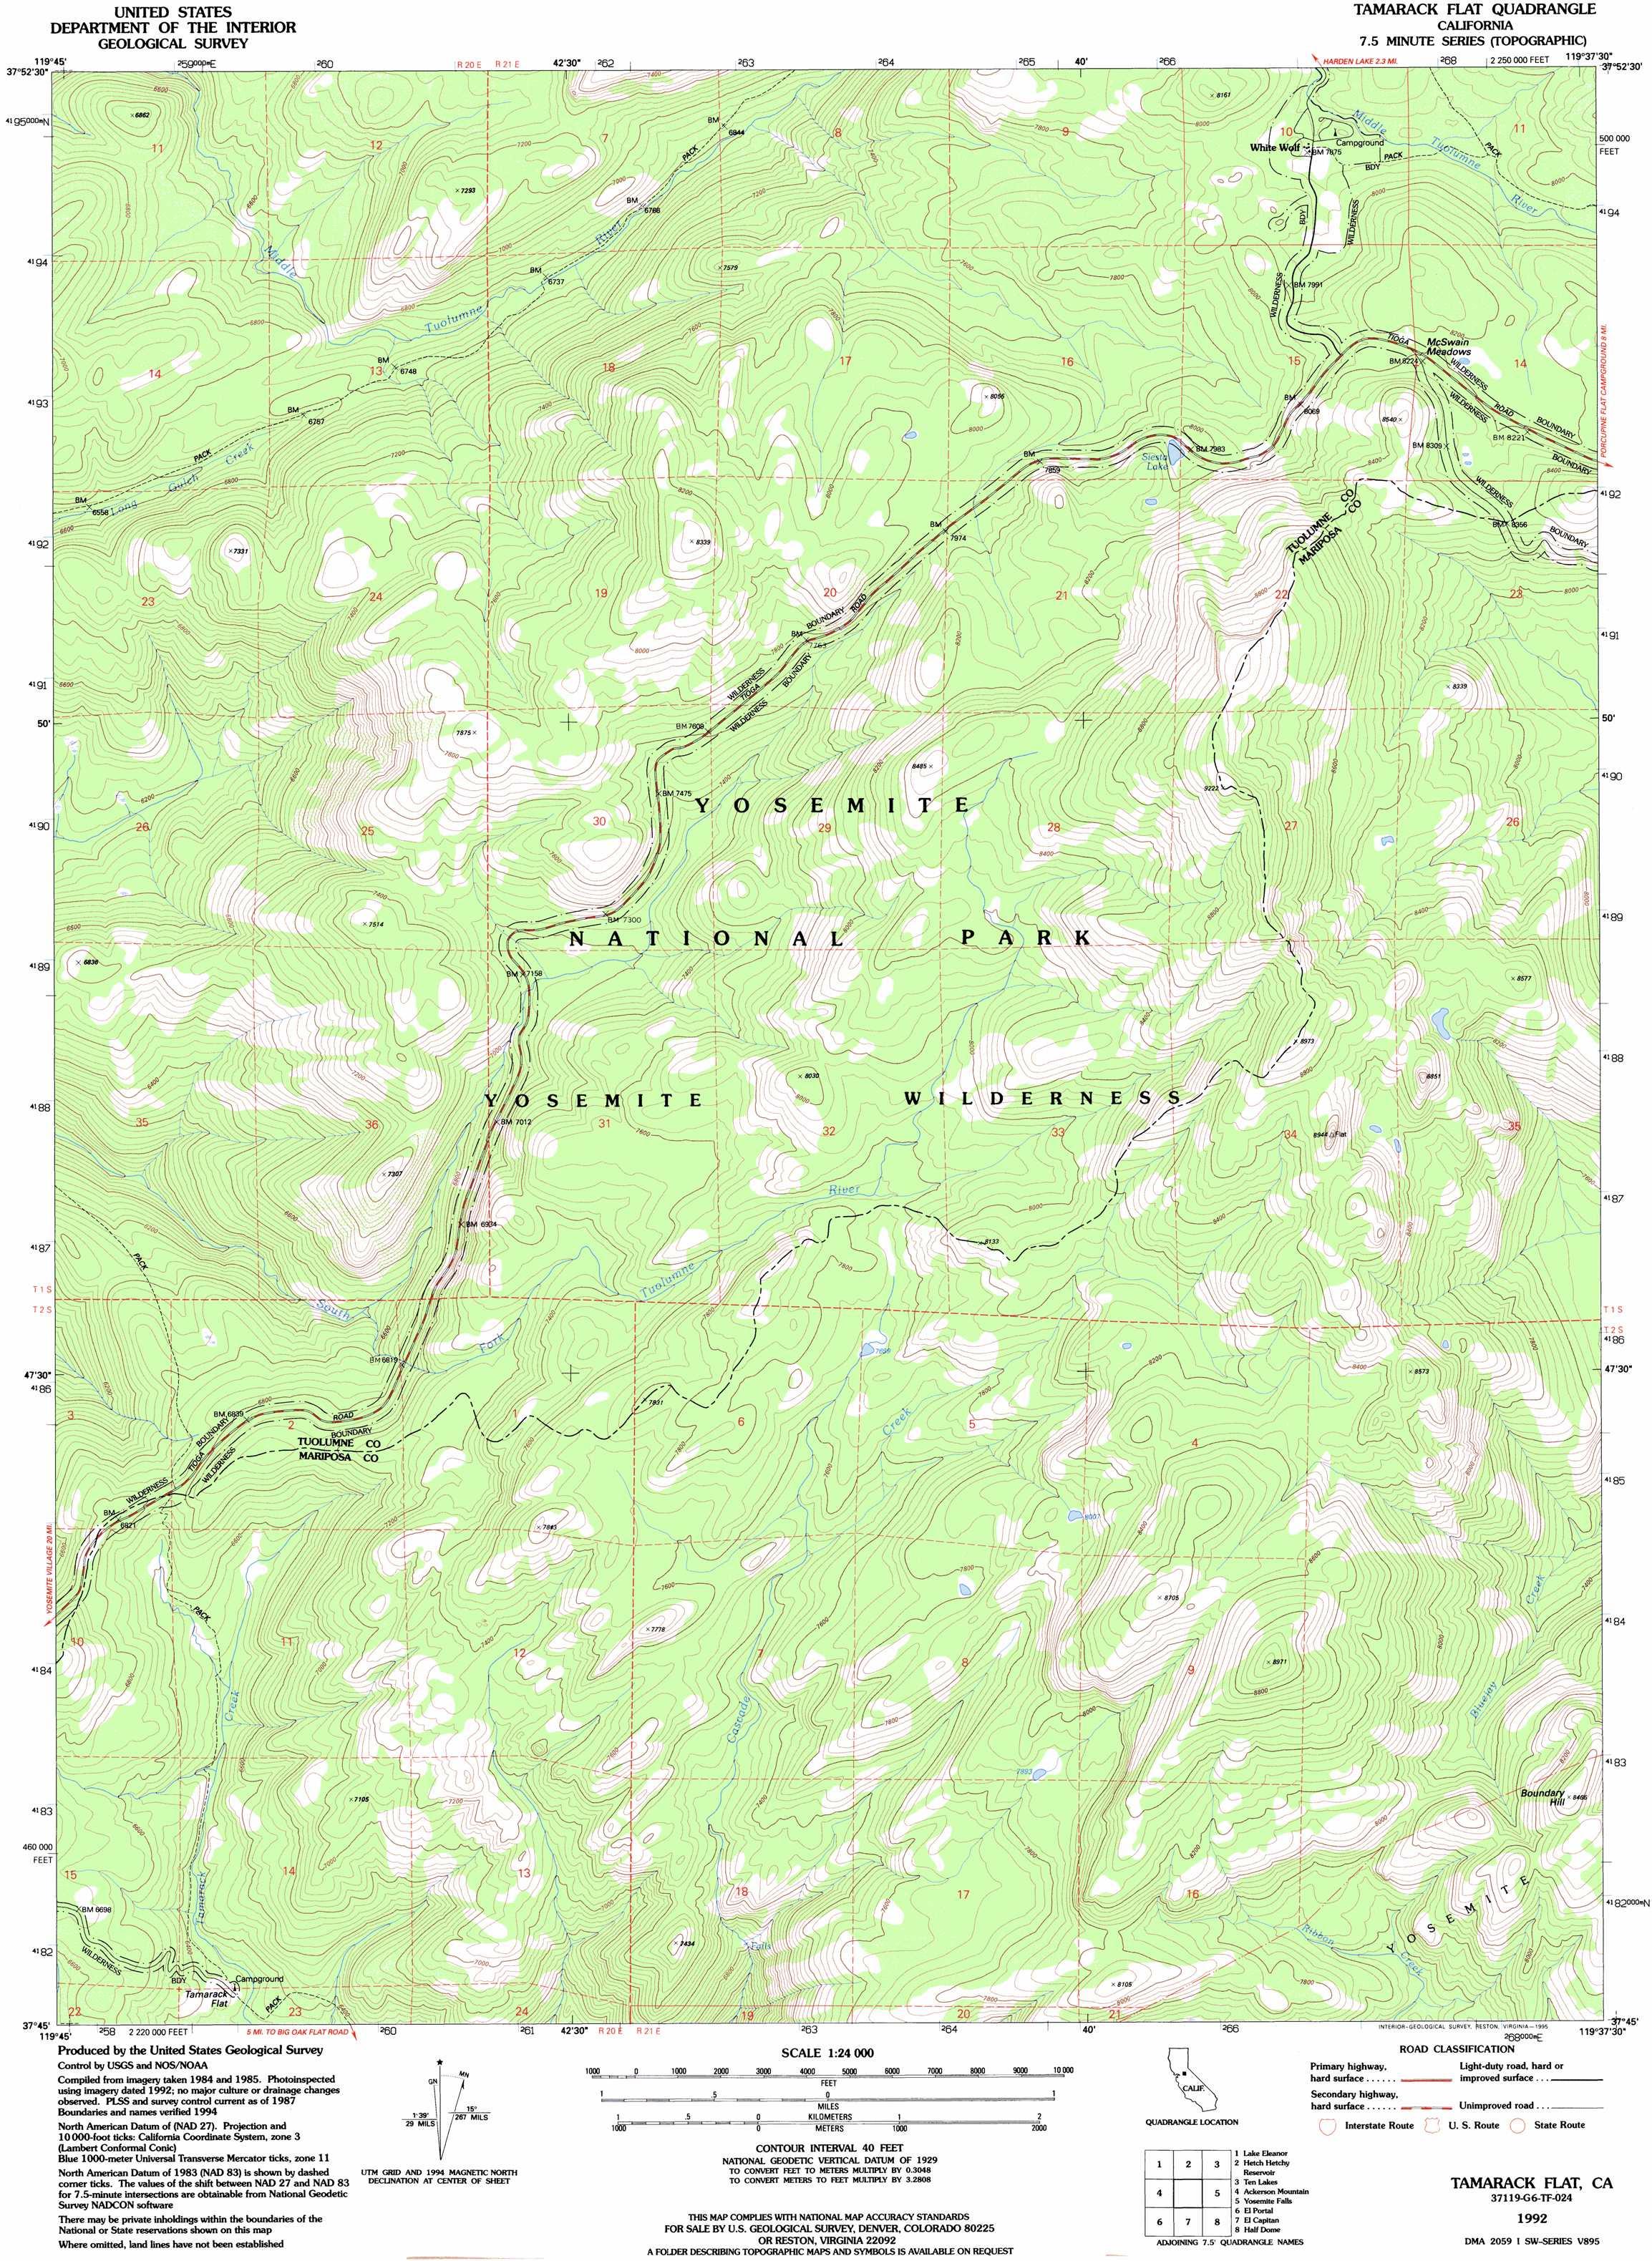 Tamarack Flat Topographic Map CA USGS Topo Quad G - Flat us map